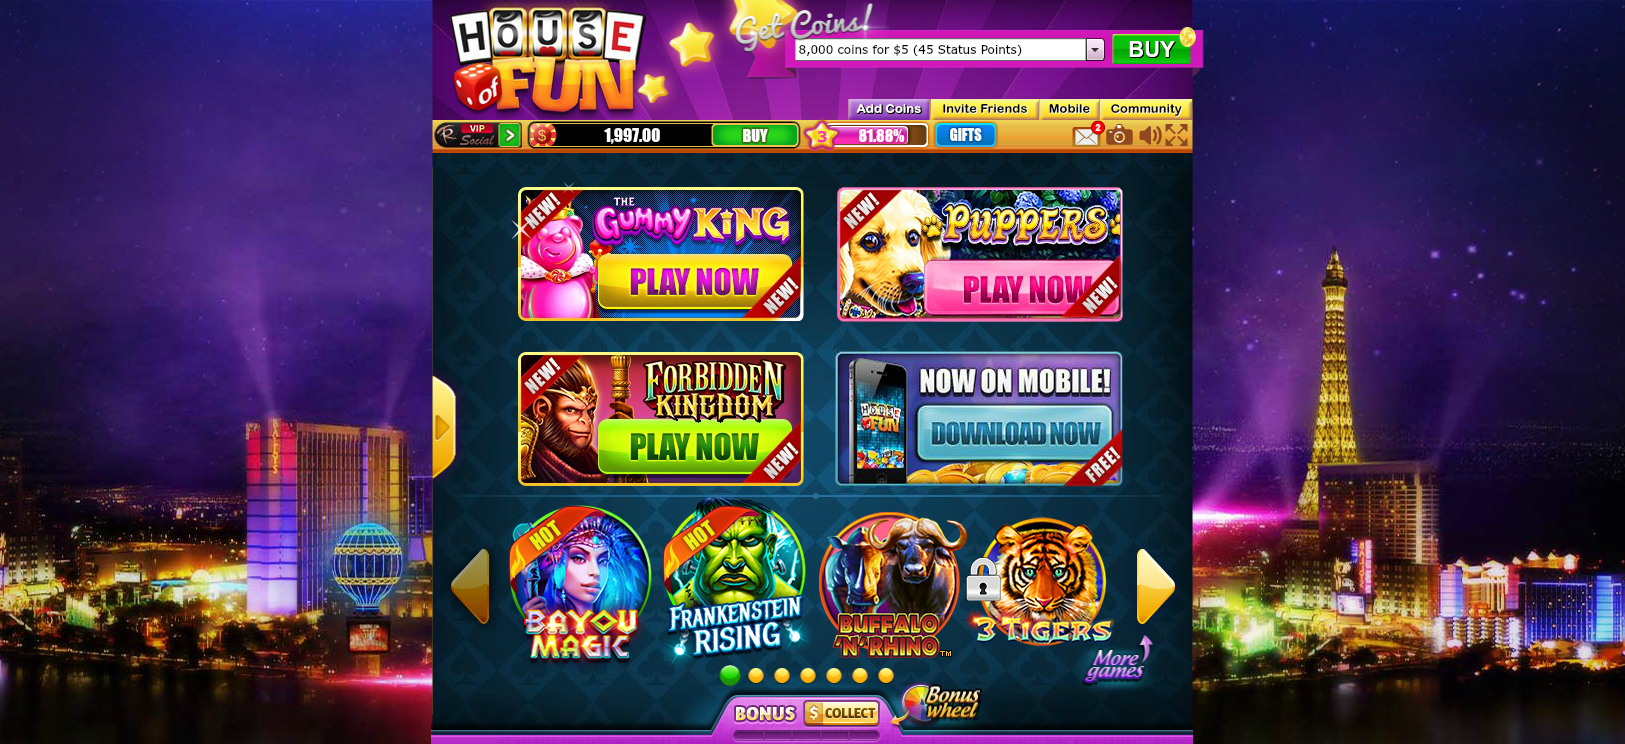 House Of Fun Slot Machines Lobby Meet House Of Fun Free Chips